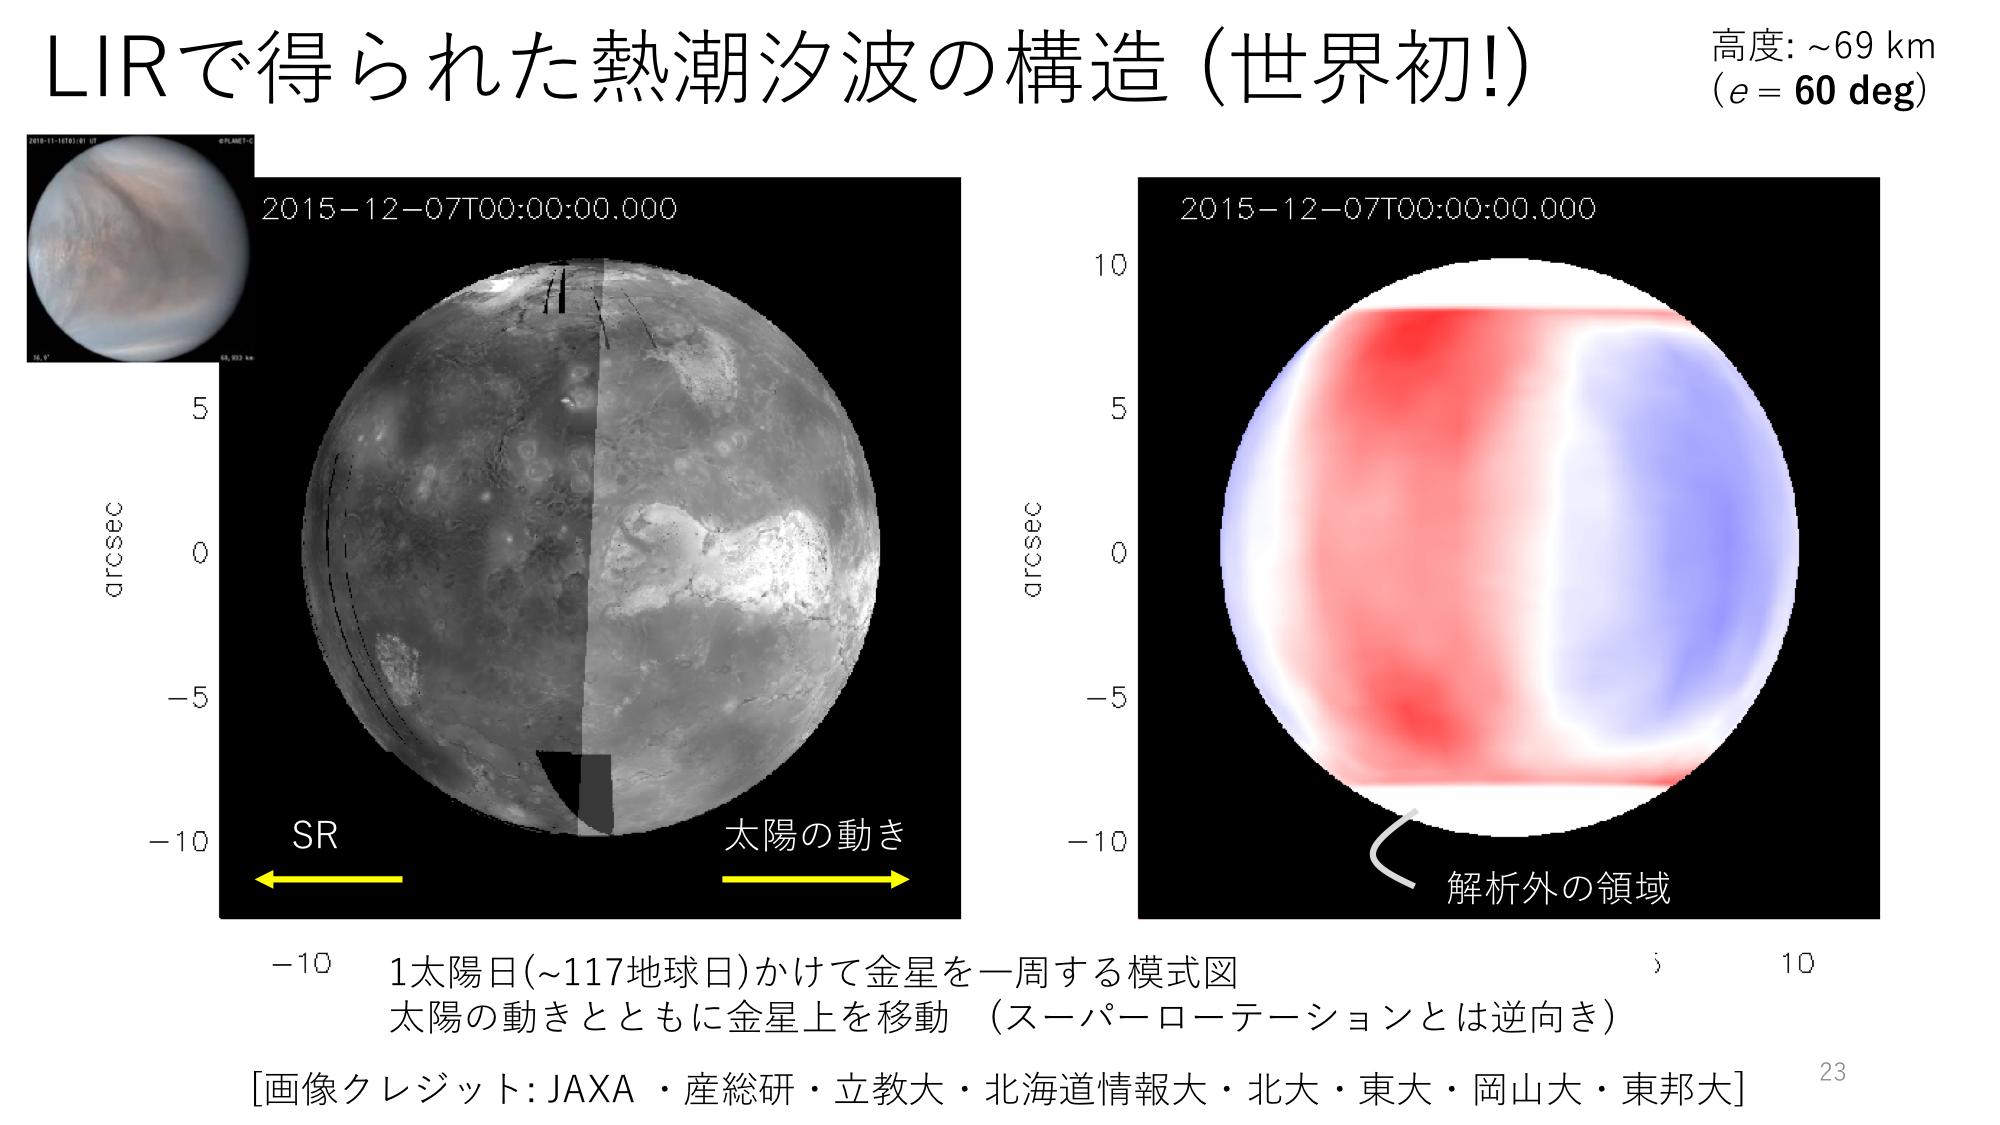 f:id:Imamura:20191119205558p:plain